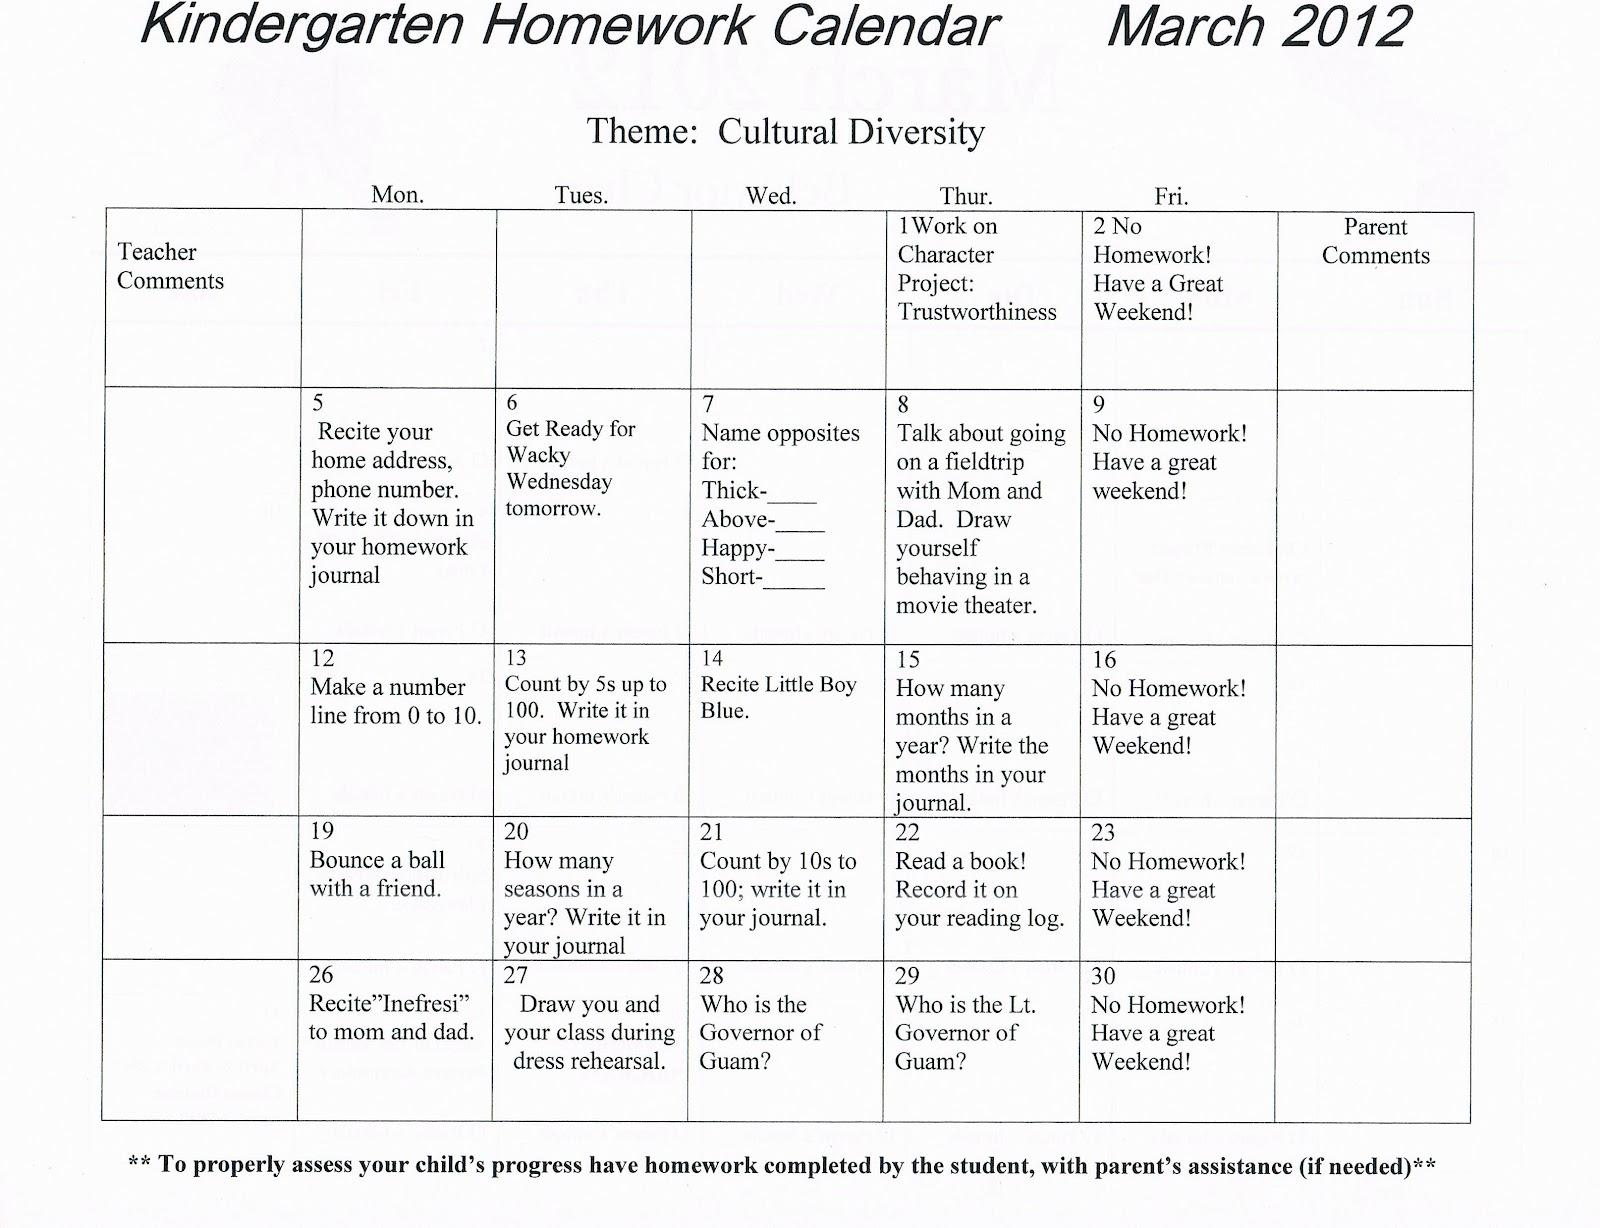 Homework Calendar Kindergarten : Kindergarten news at lbj